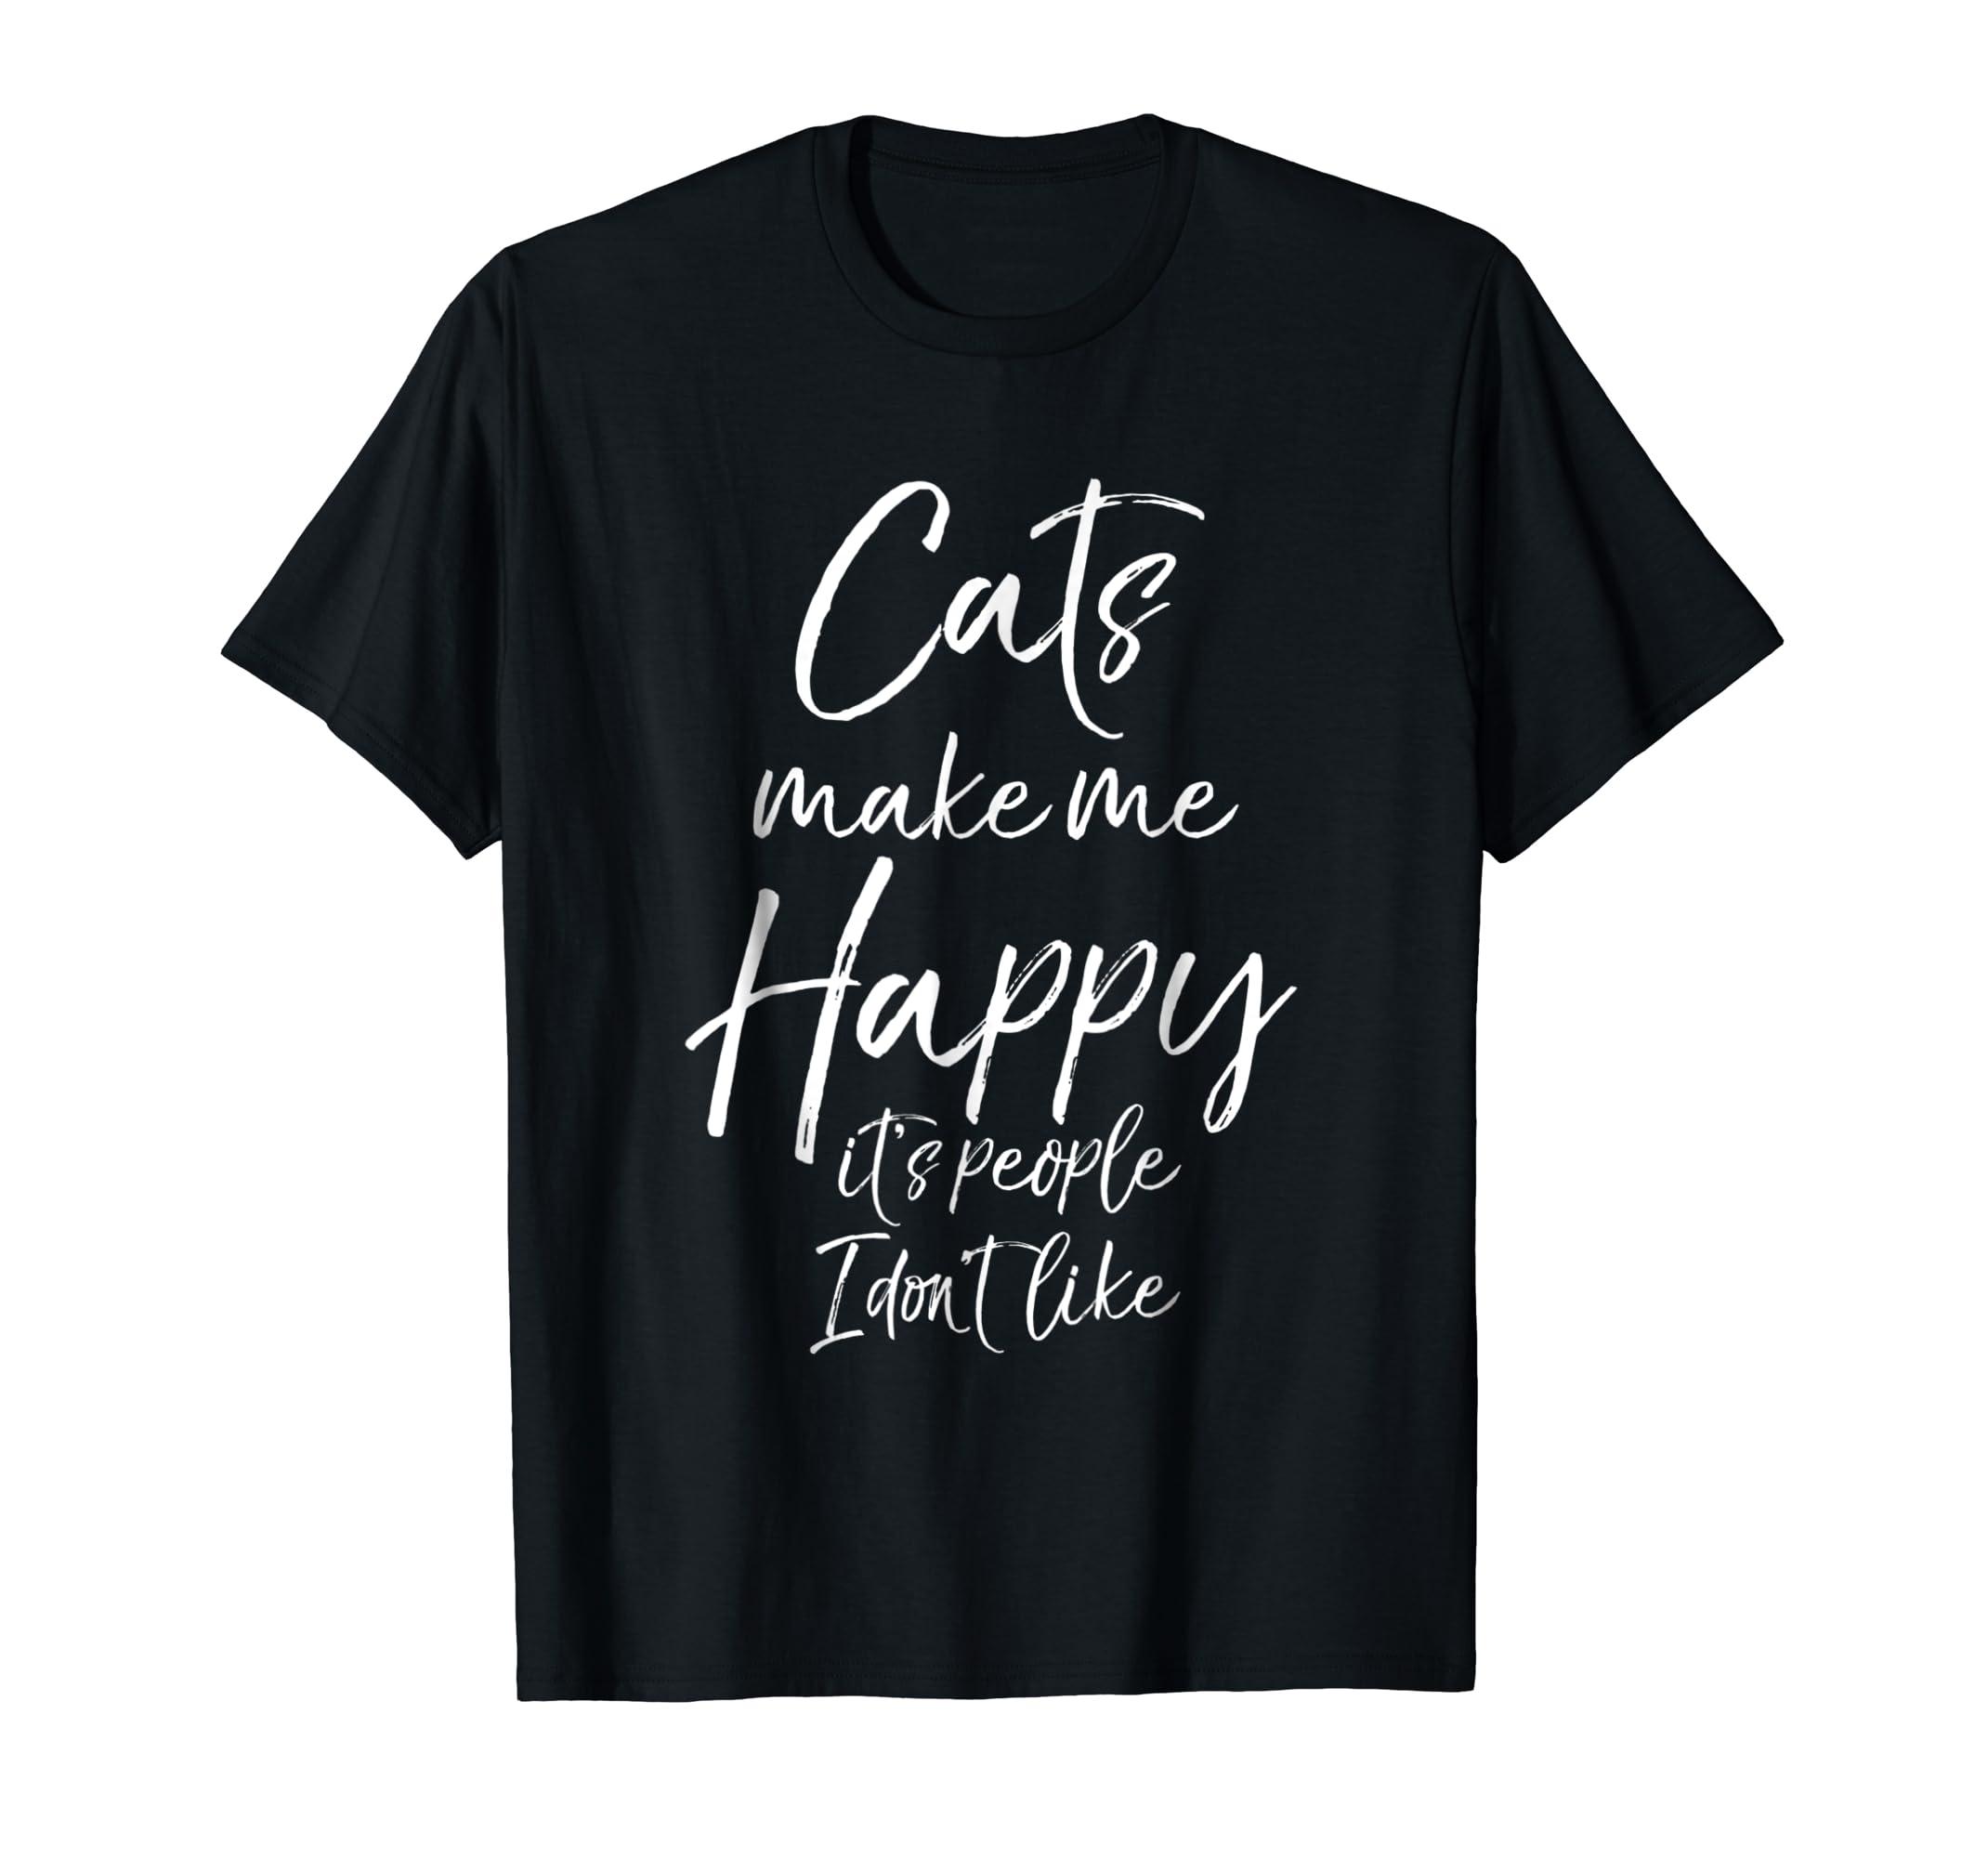 d549cf1c1e Amazon.com: Cats Make Me Happy it's People I Don't Like Shirt Cute Tee:  Clothing